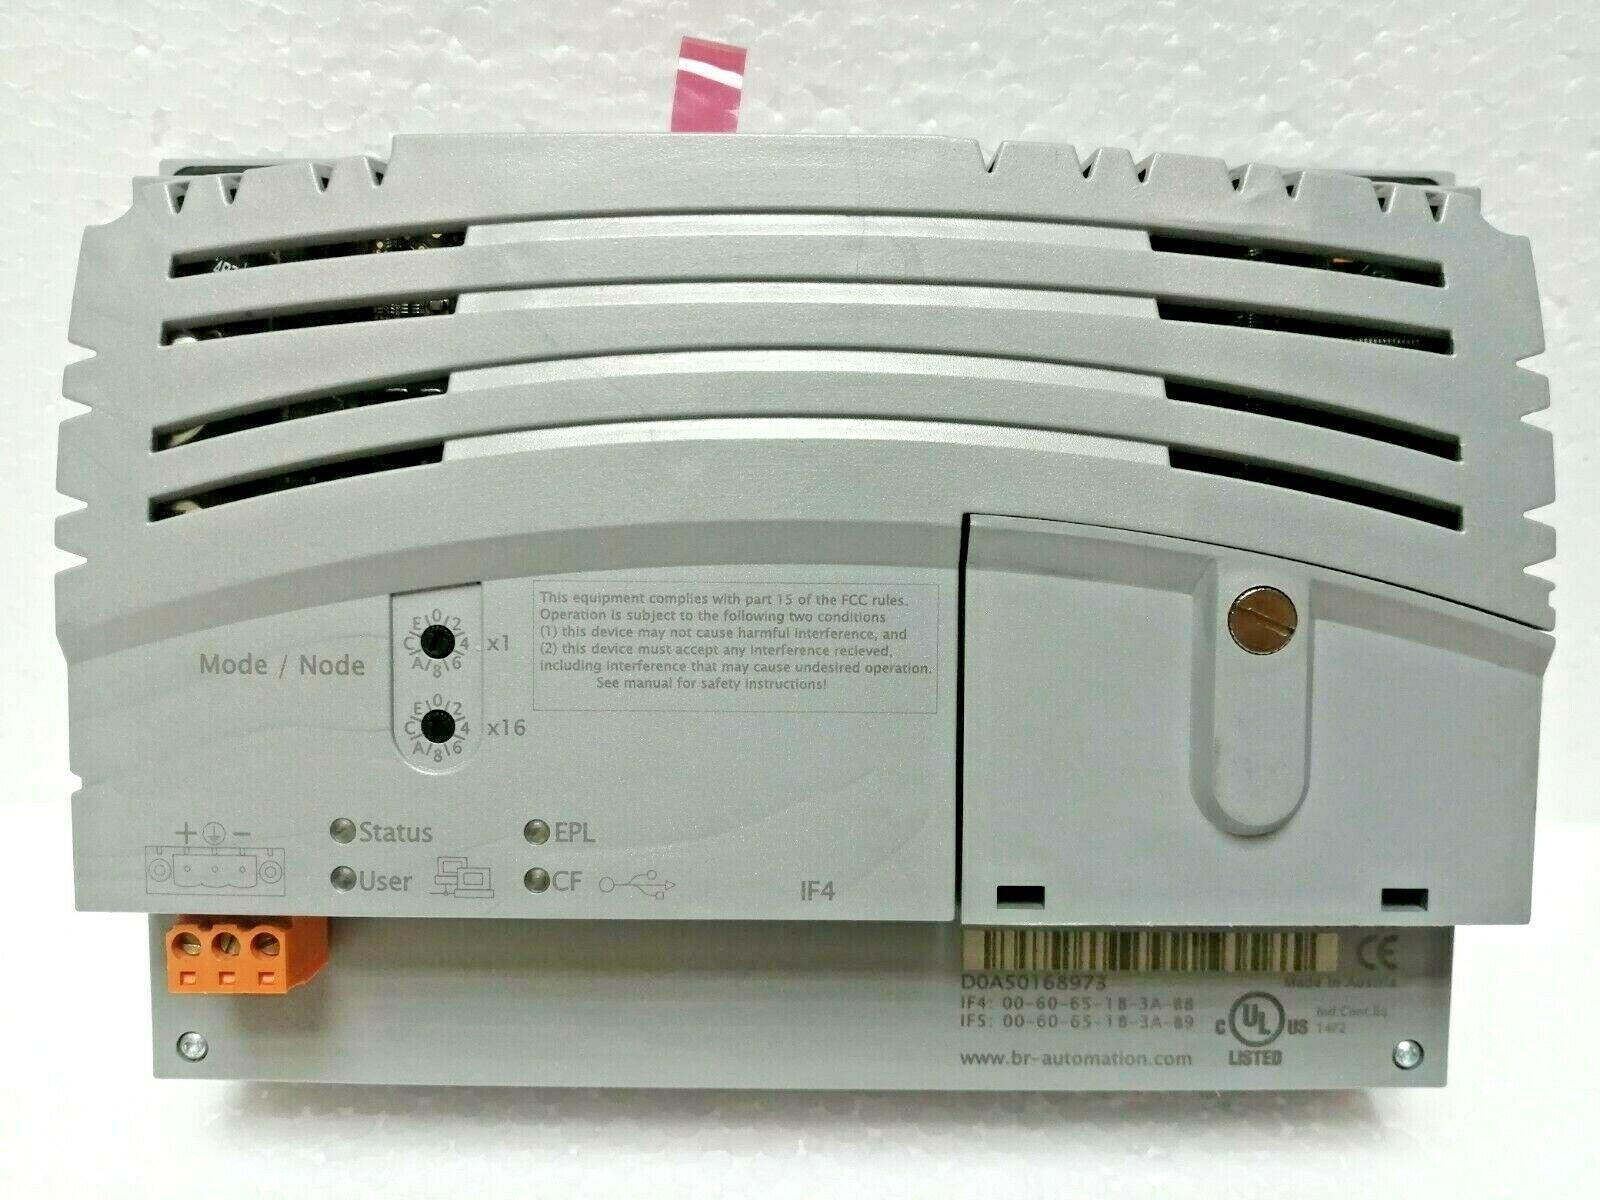 5D2500.41 5C2001.01 贝加莱显示屏无显示故障 4P3040.01-K05 维修点